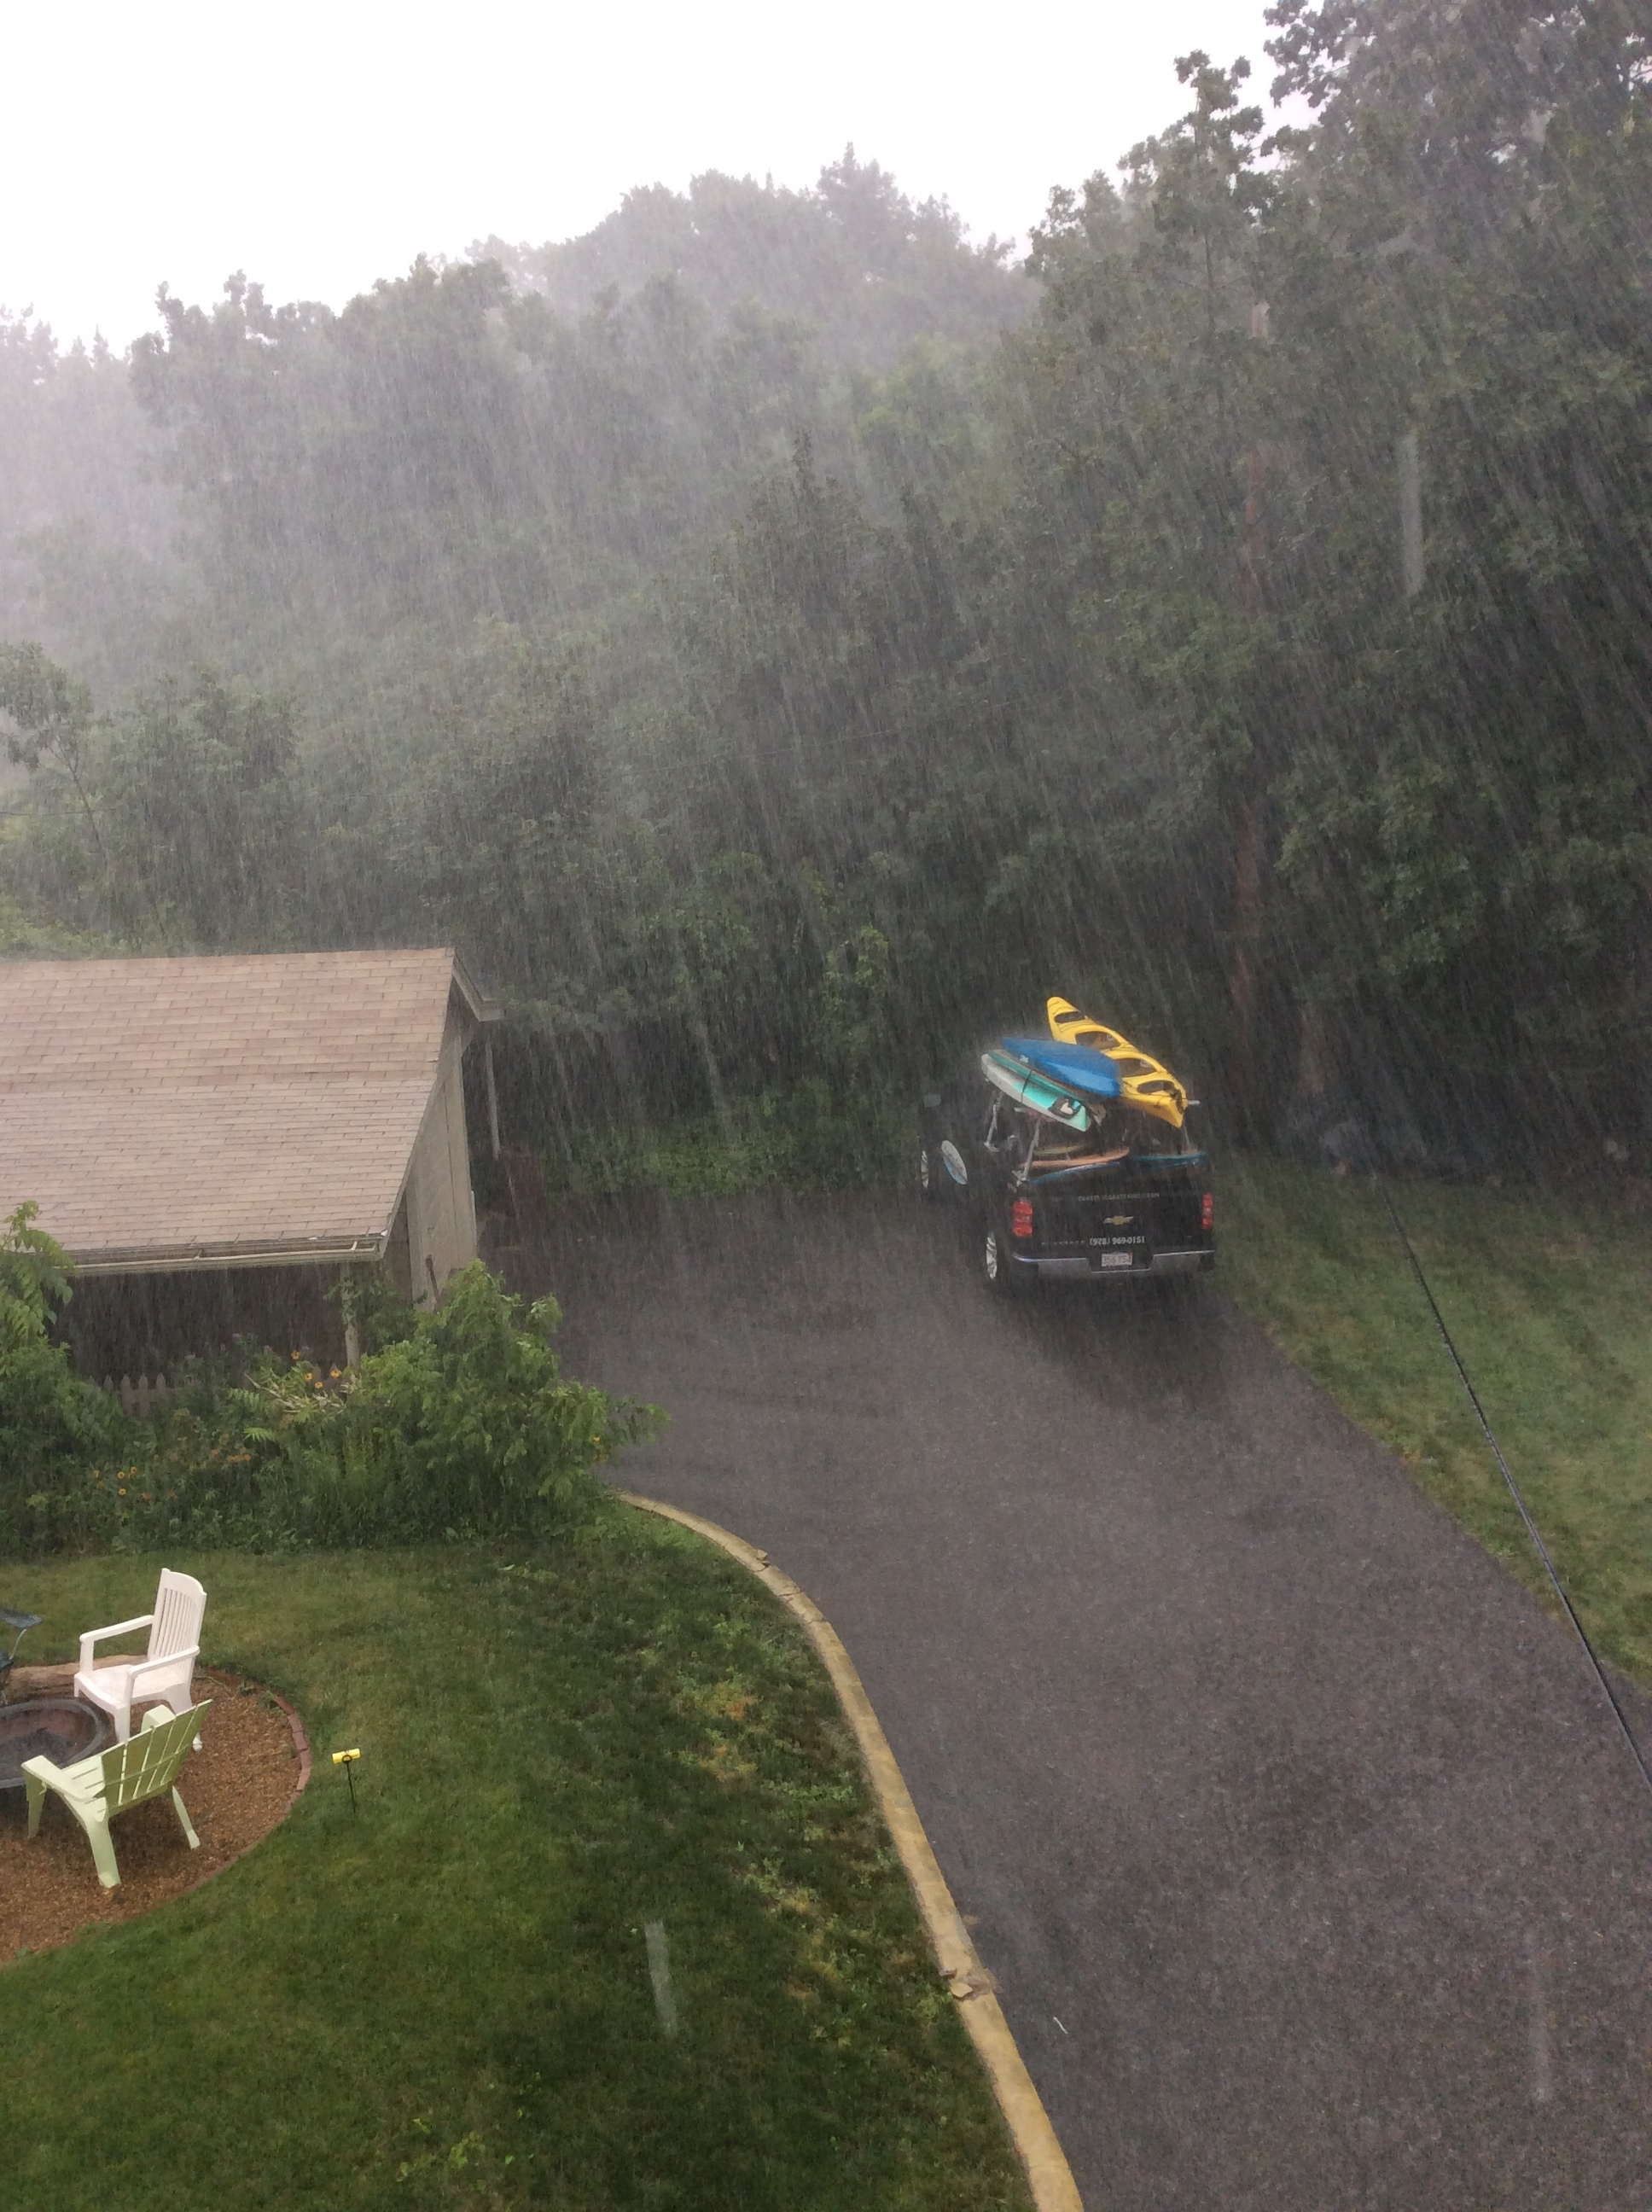 The rain before the rainbow